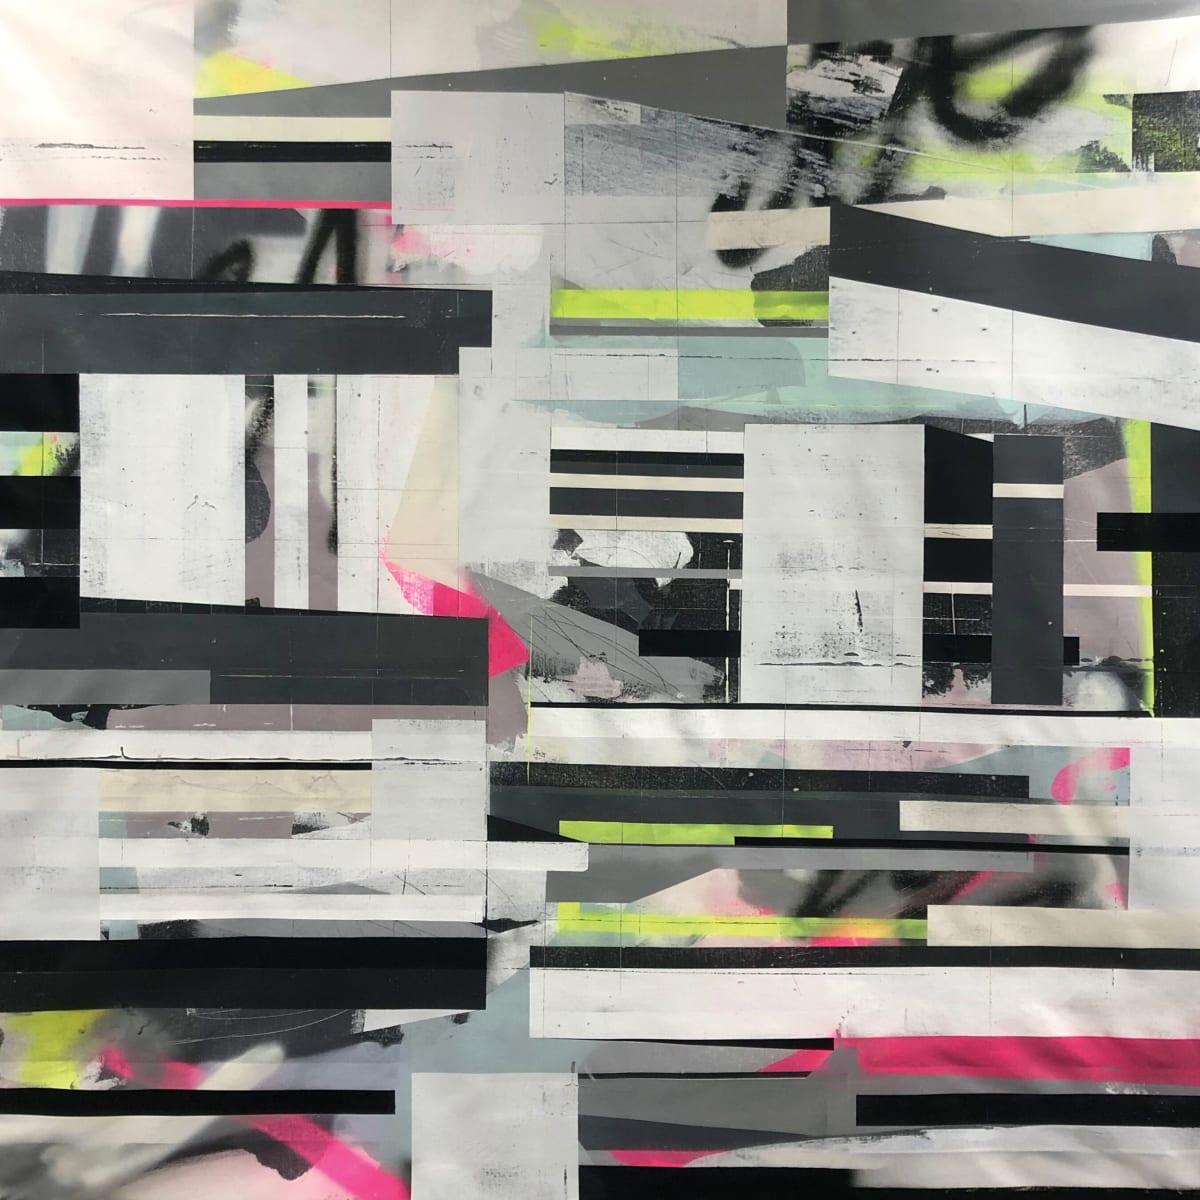 Zandra Stratford, Glitch, 2019